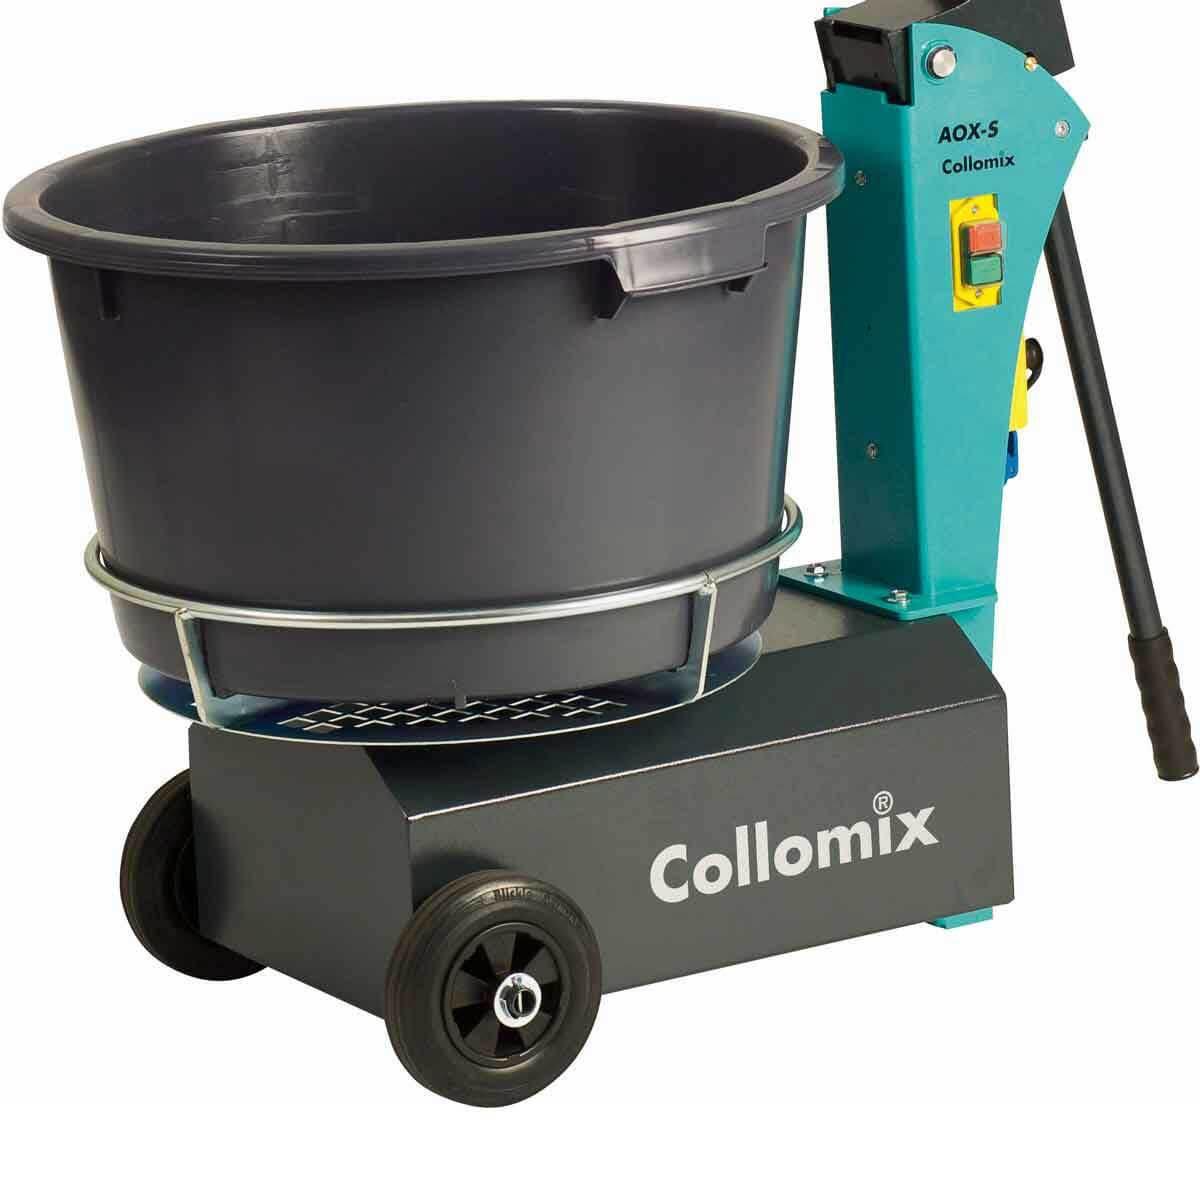 Collomix AOX-S bucket mixer bucket